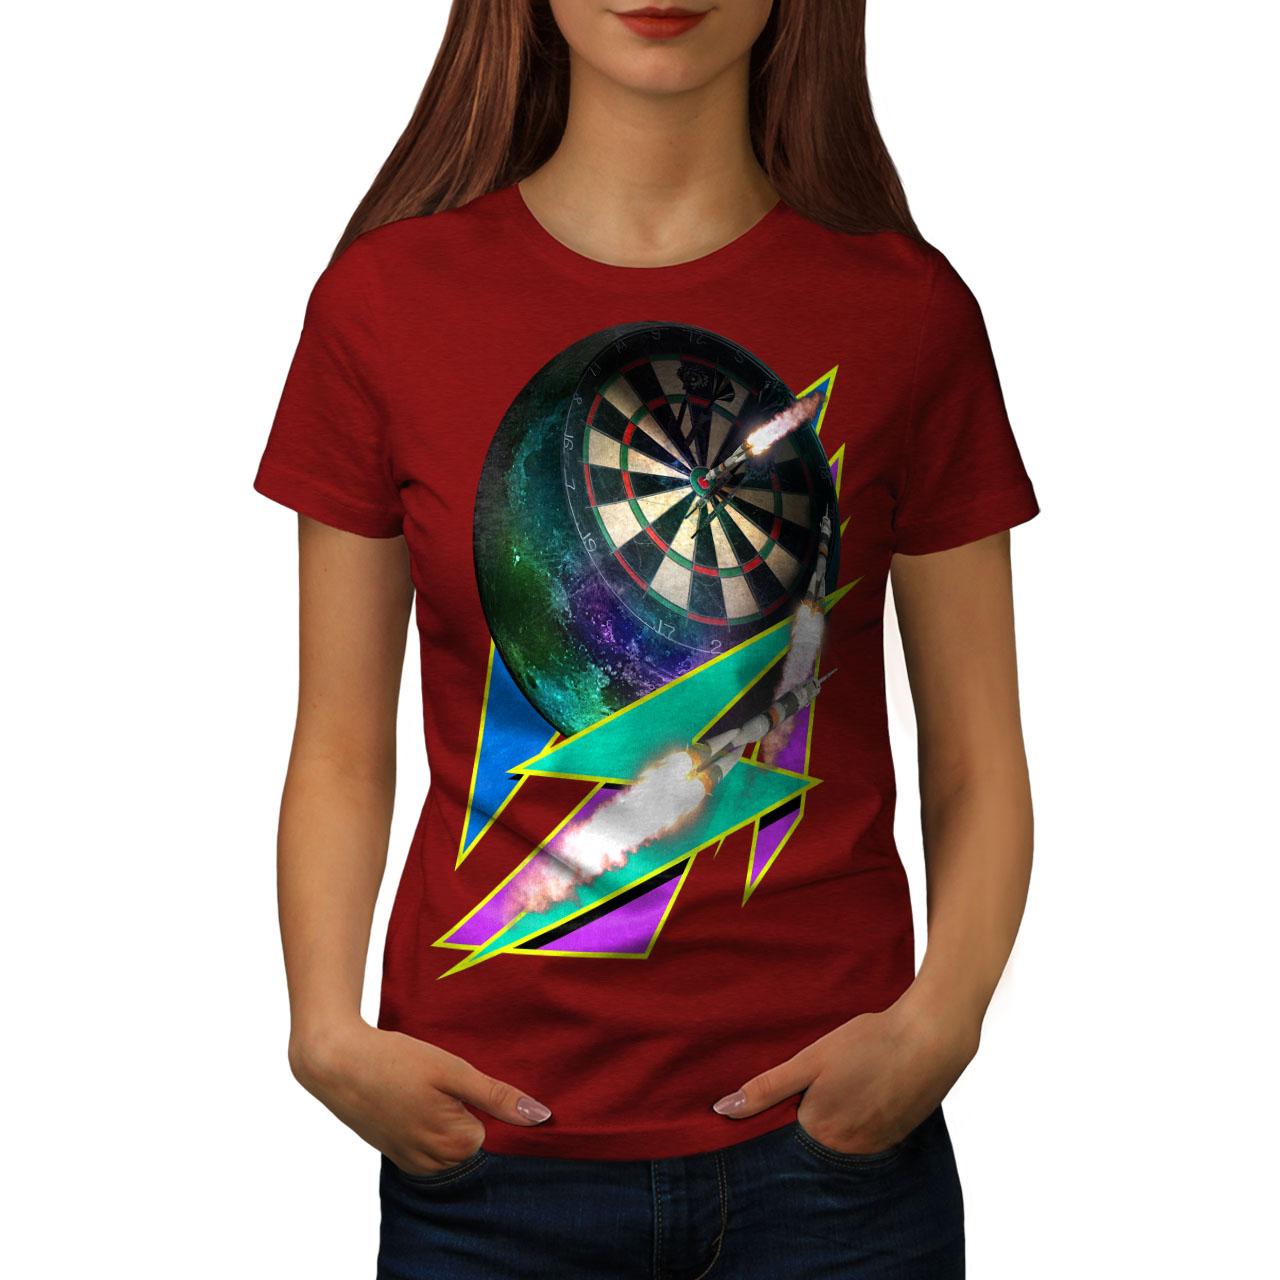 miniature 9 - Wellcoda Dart Board Gaming Womens T-shirt, Achieve Casual Design Printed Tee